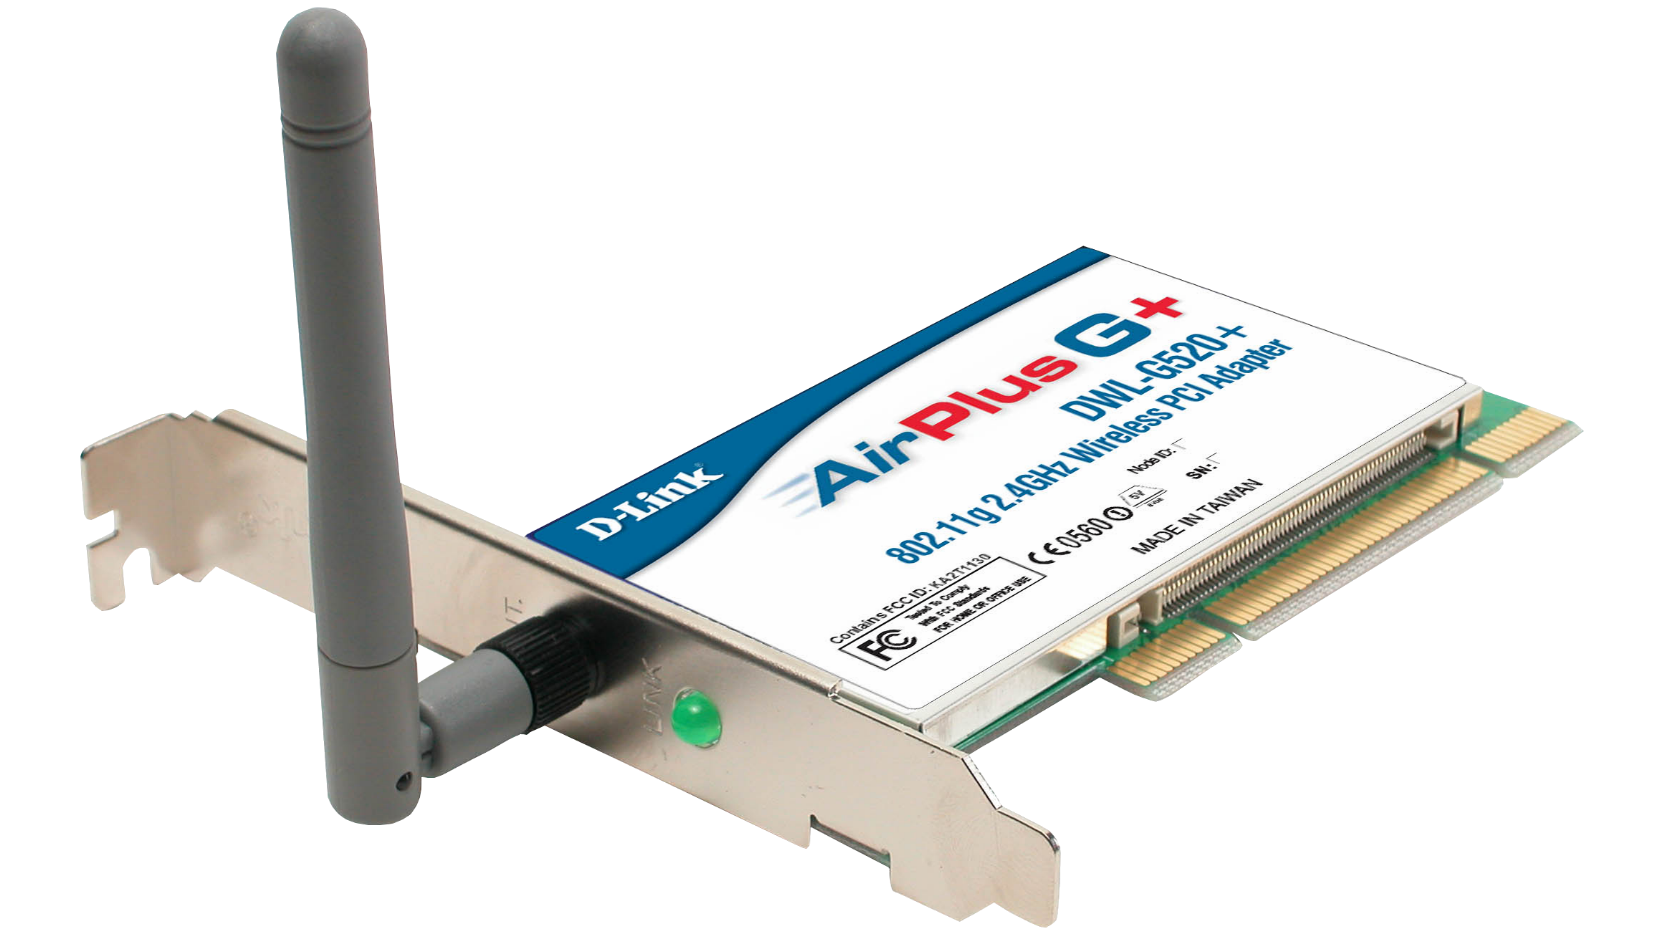 D-link airplus dwl 520+ w-lan karte youtube.